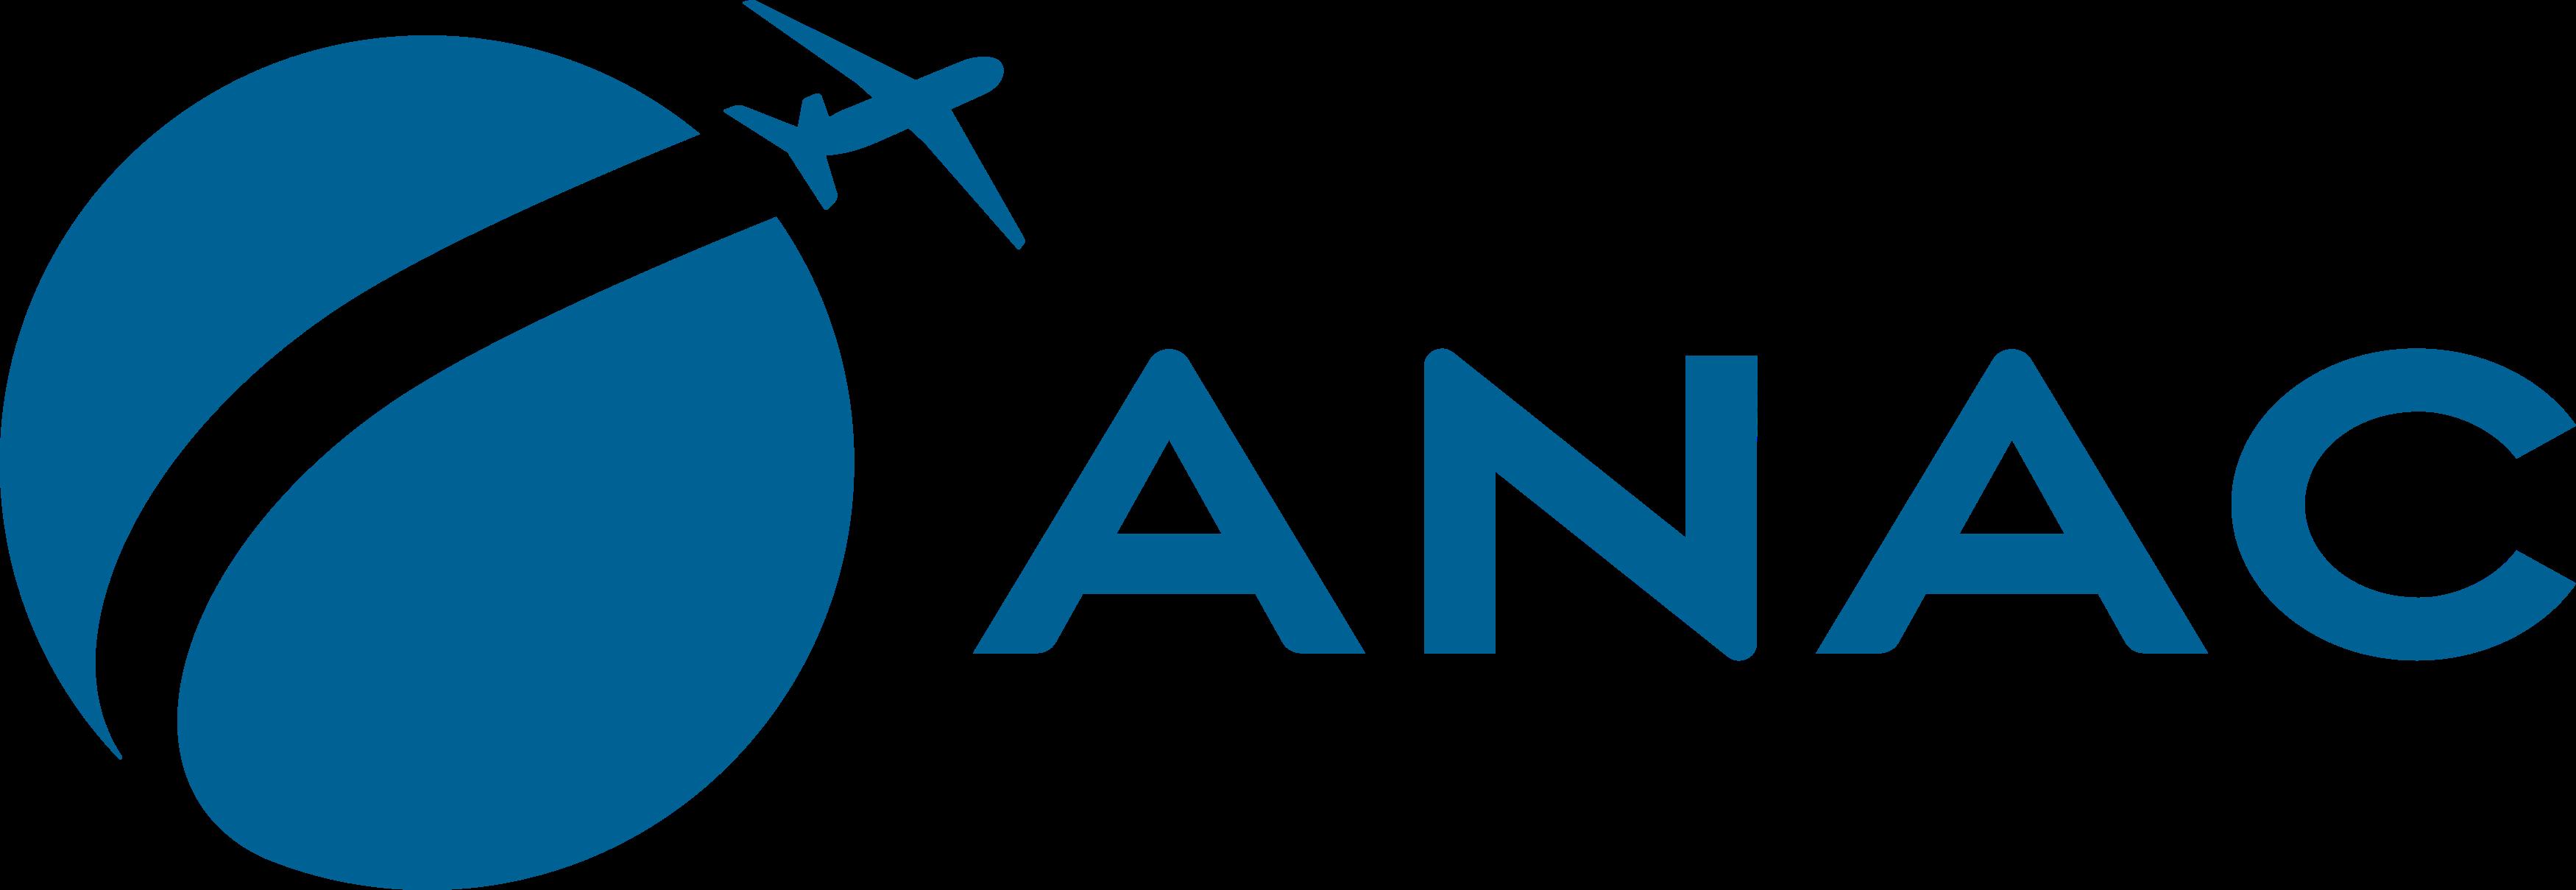 anac-logo-2